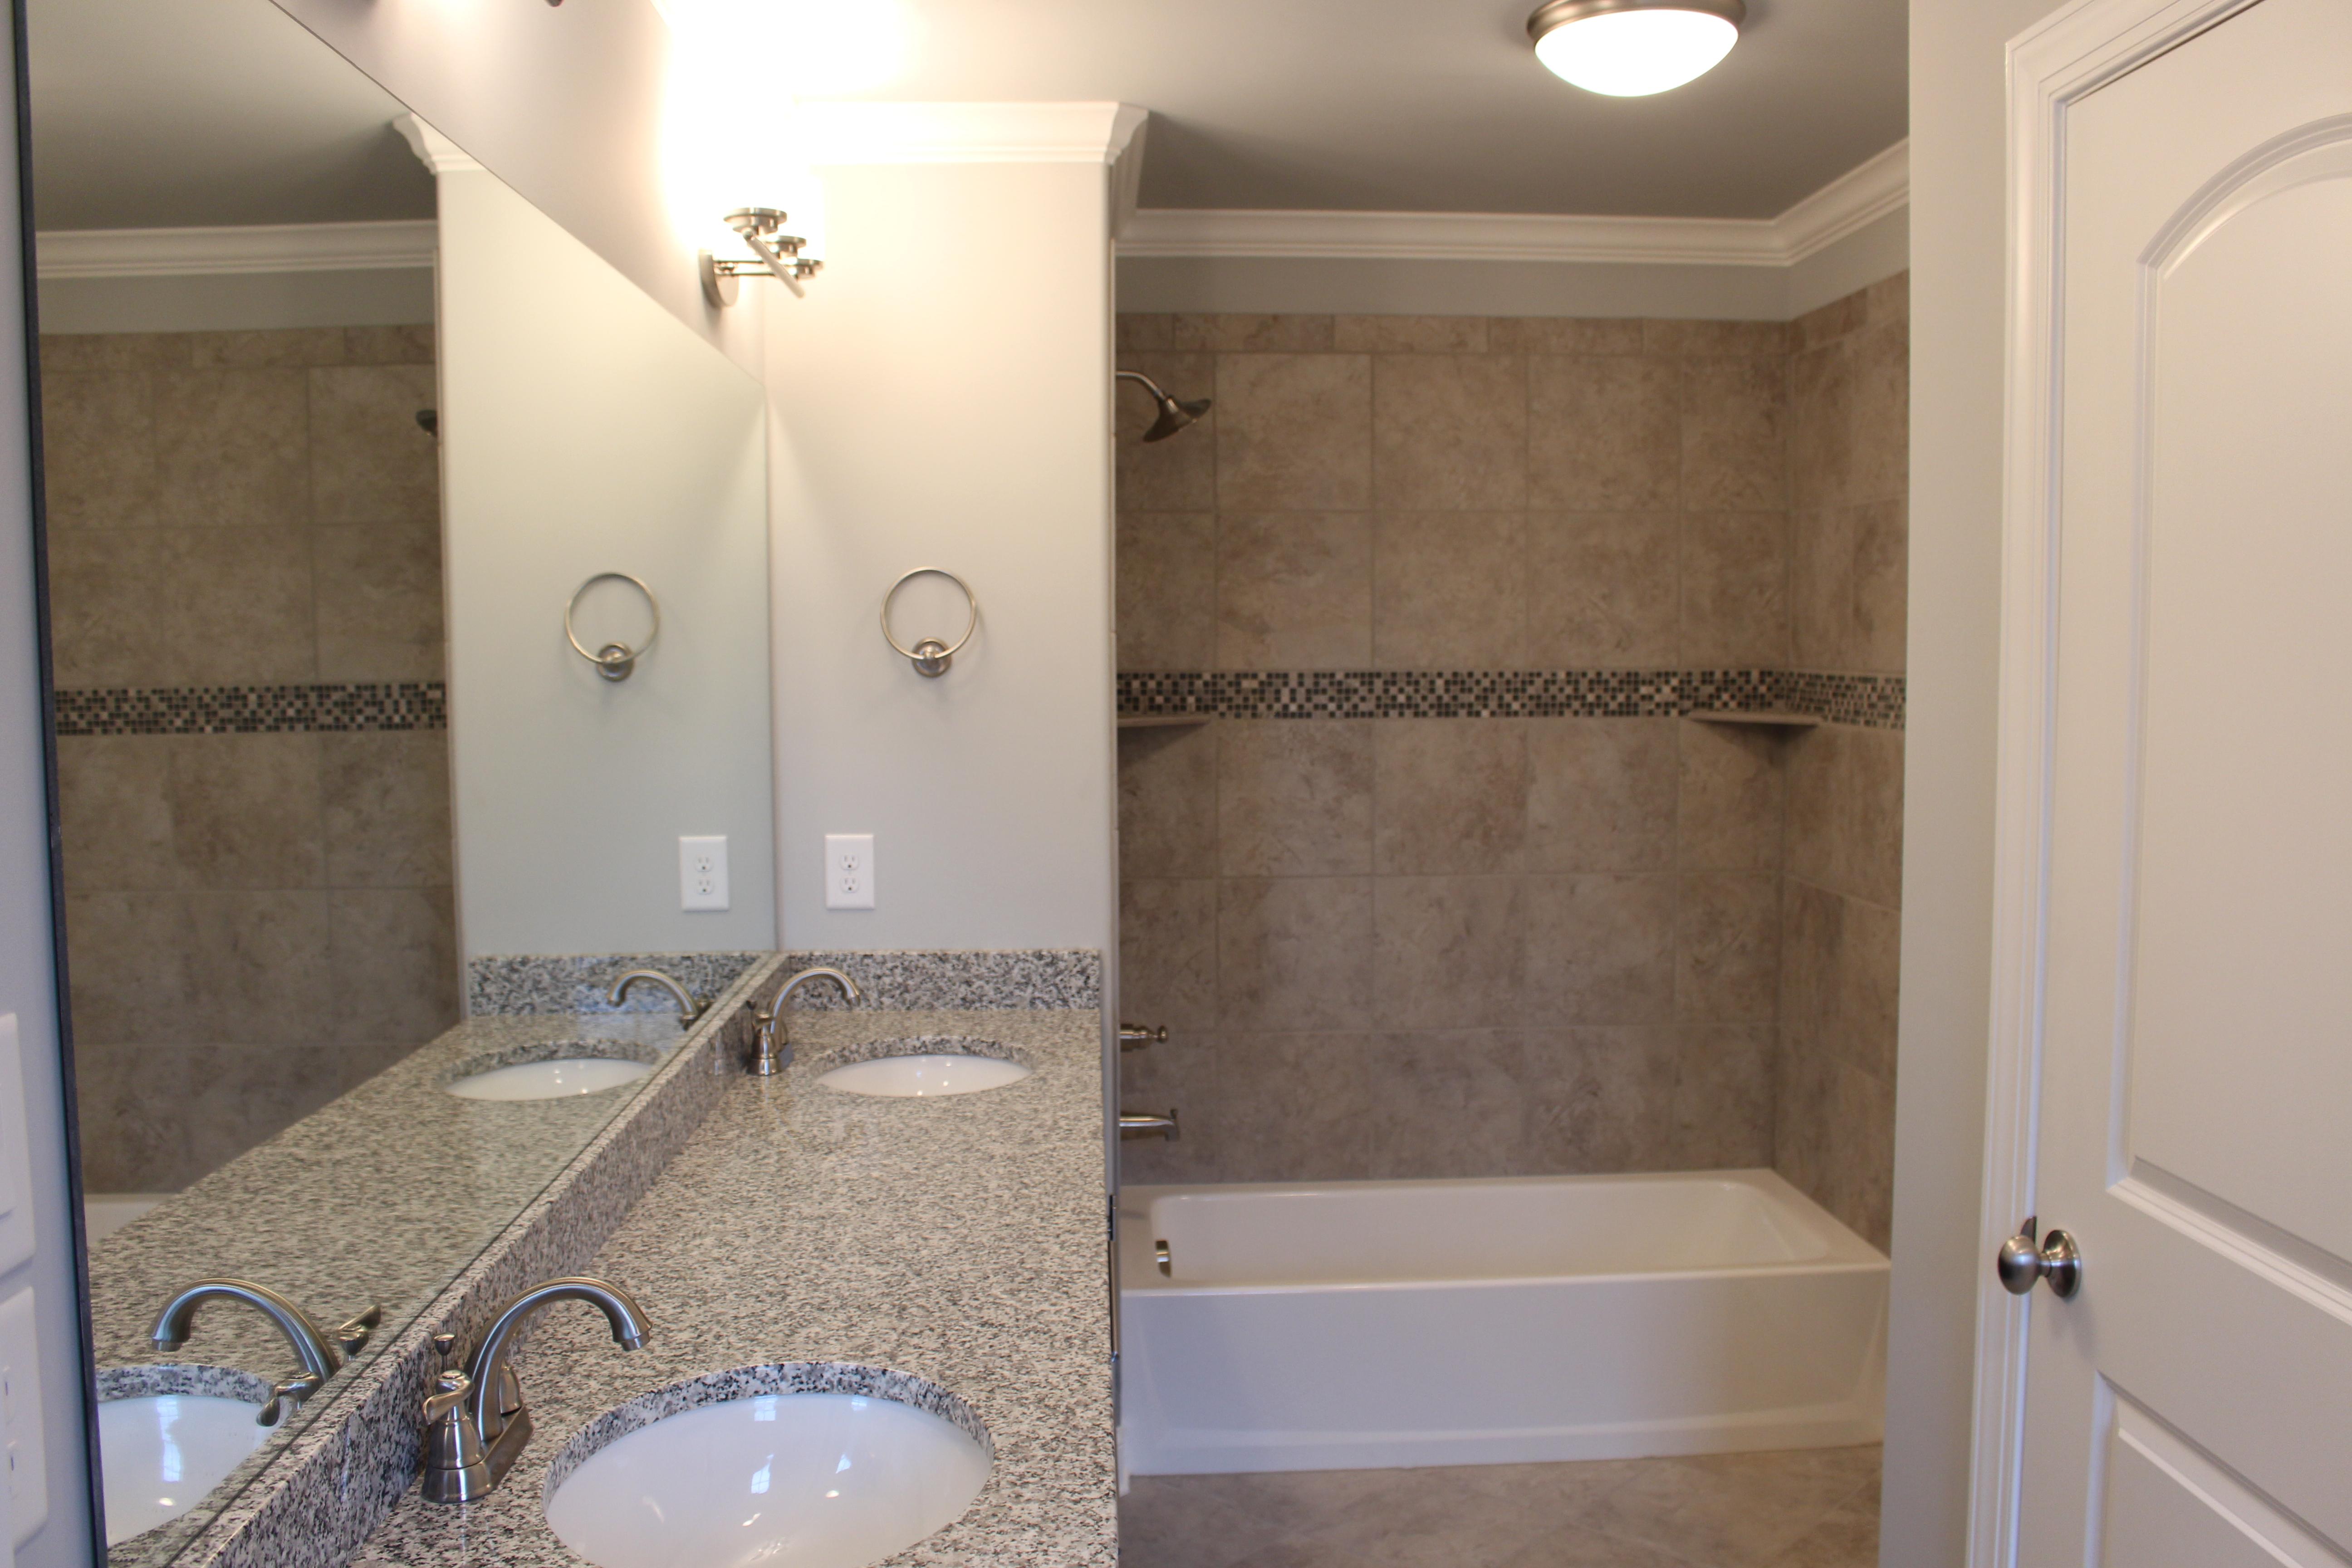 Lot 202 AB secondary bath